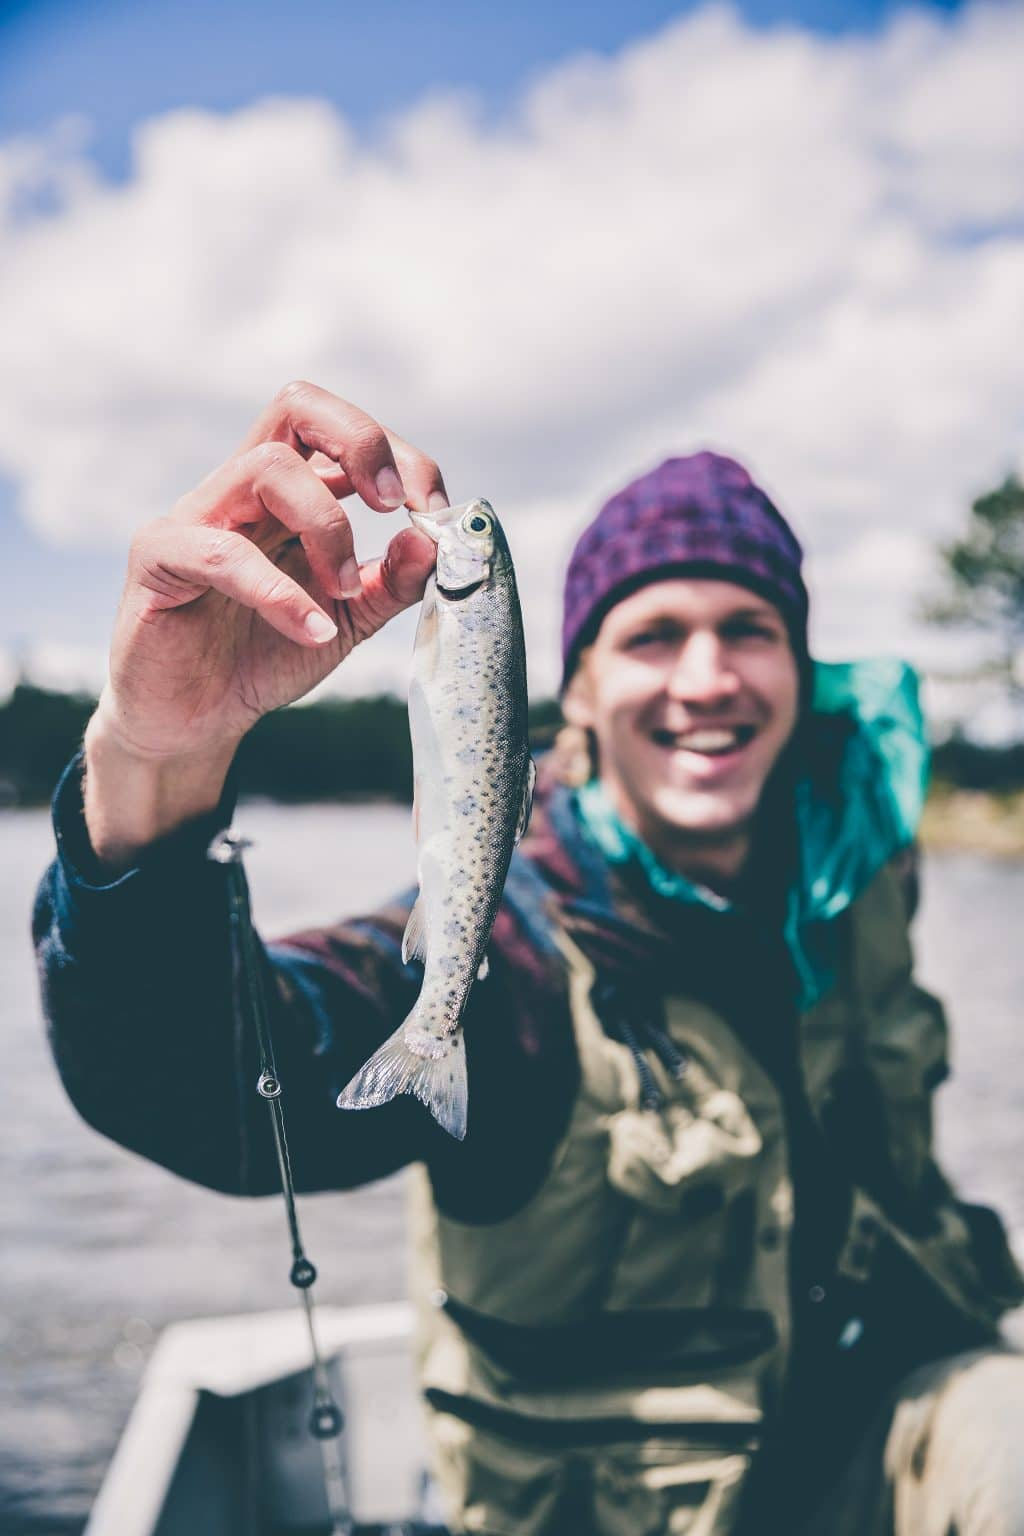 Man Holding Fish 2019